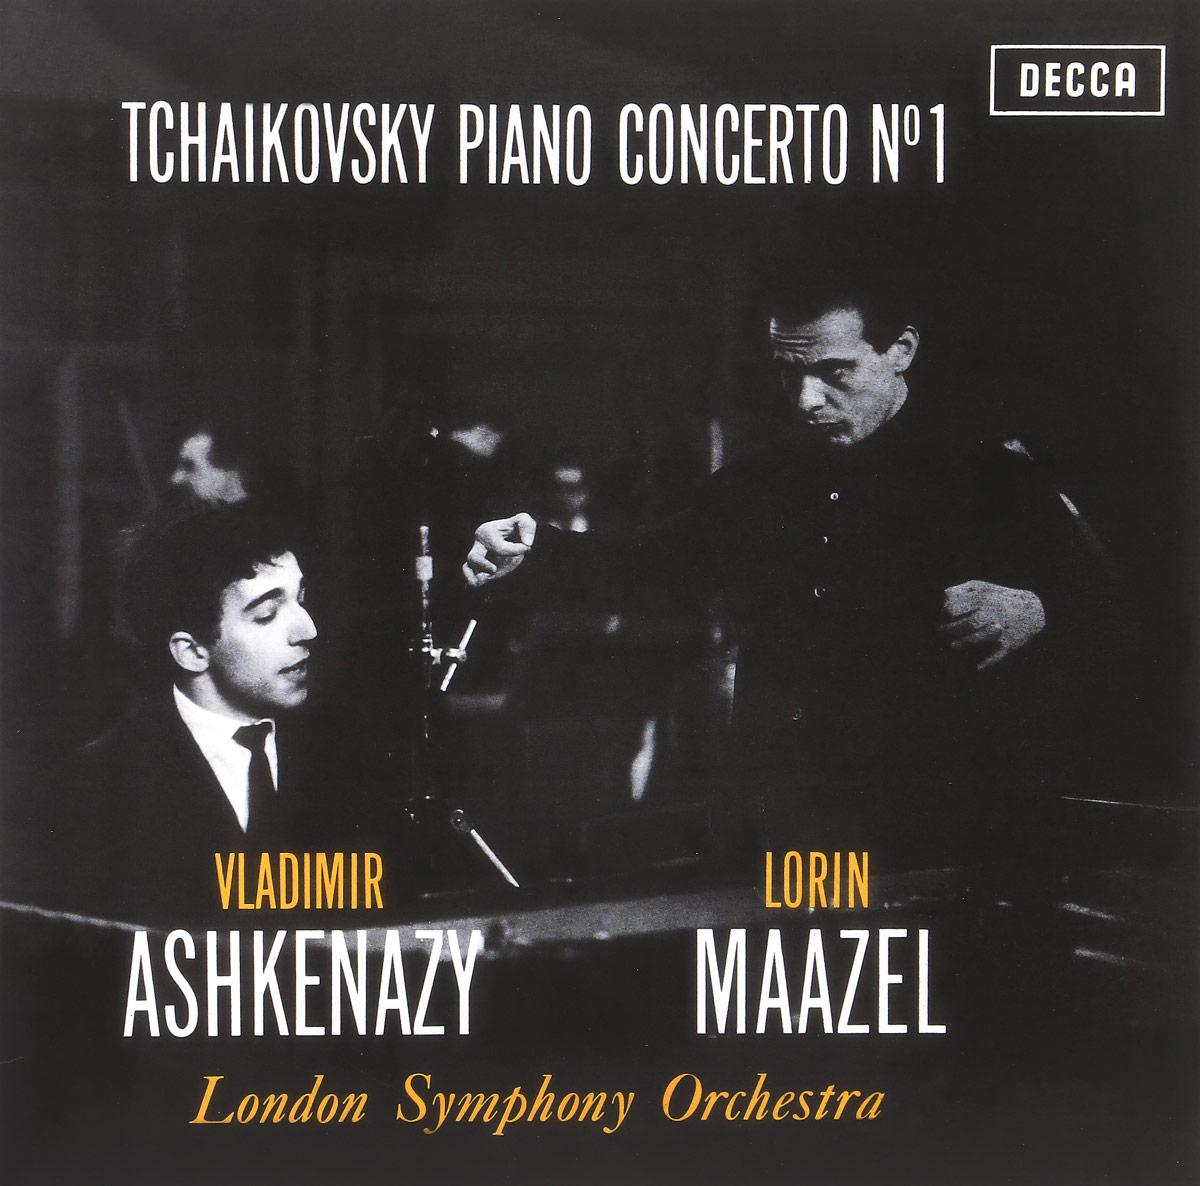 Ashkenazy, Vladimir Tchaikovsky: Piano Concerto No.1 (LP) стоимость